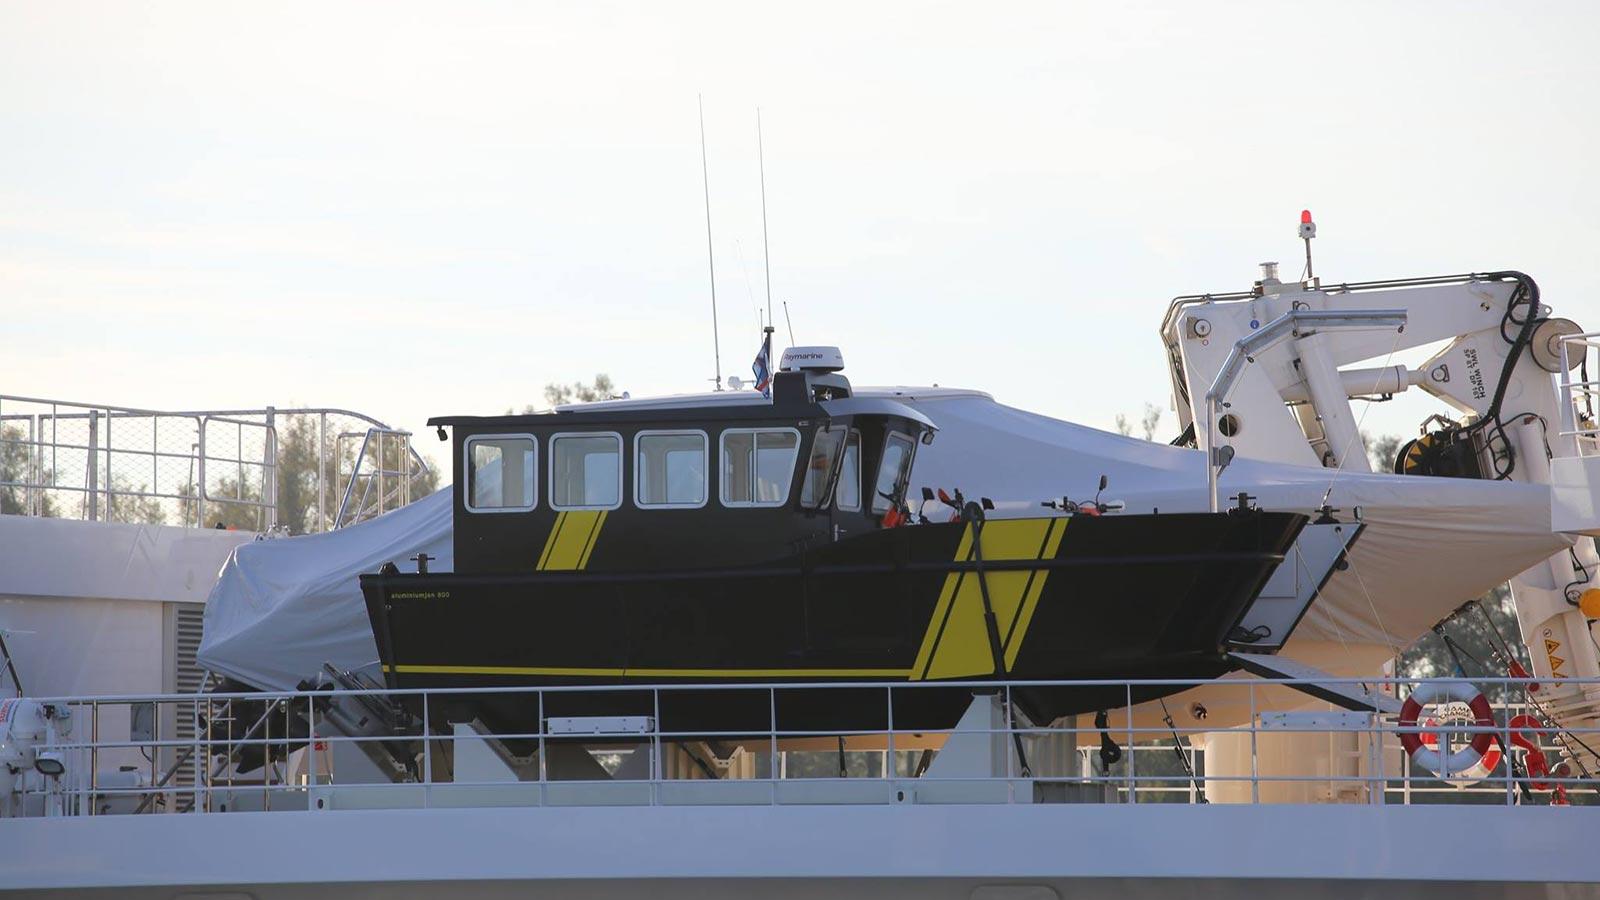 Modellen AluminiumJon.nl - Sea Charger - Landingsvaartuig